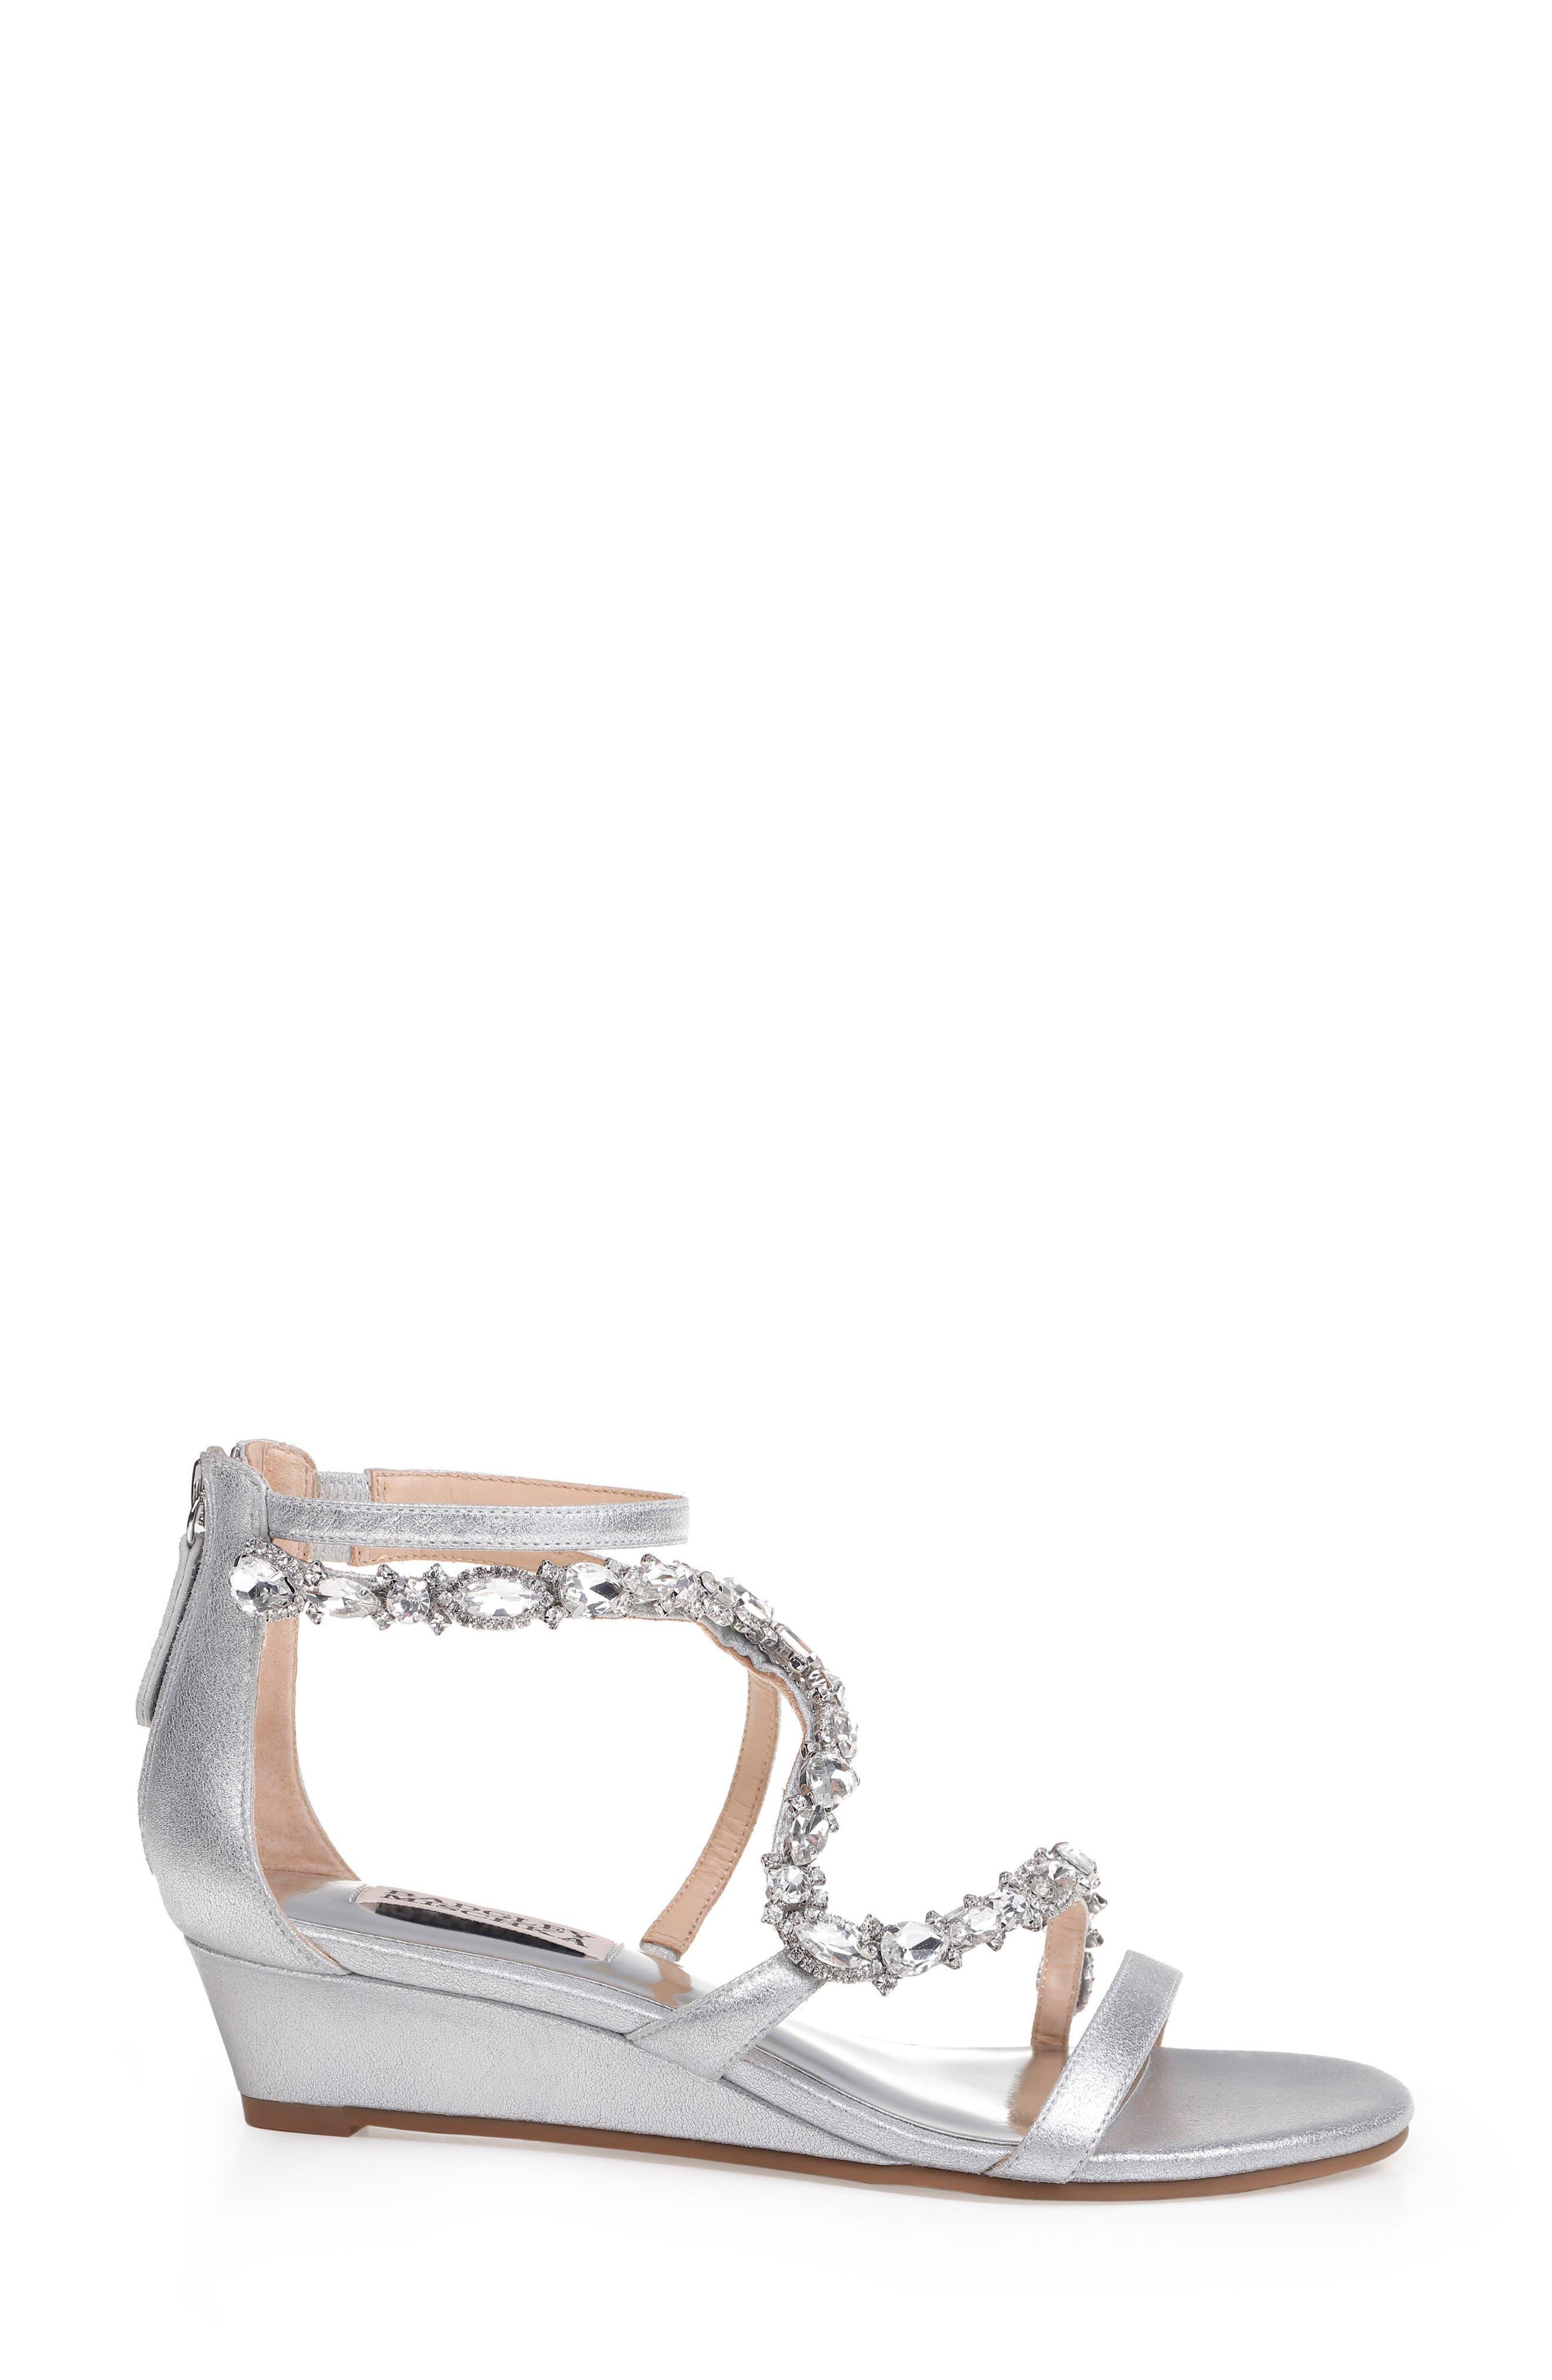 Alternate Image 3  - Badgley Mischka Sierra Strappy Wedge Sandal (Women)